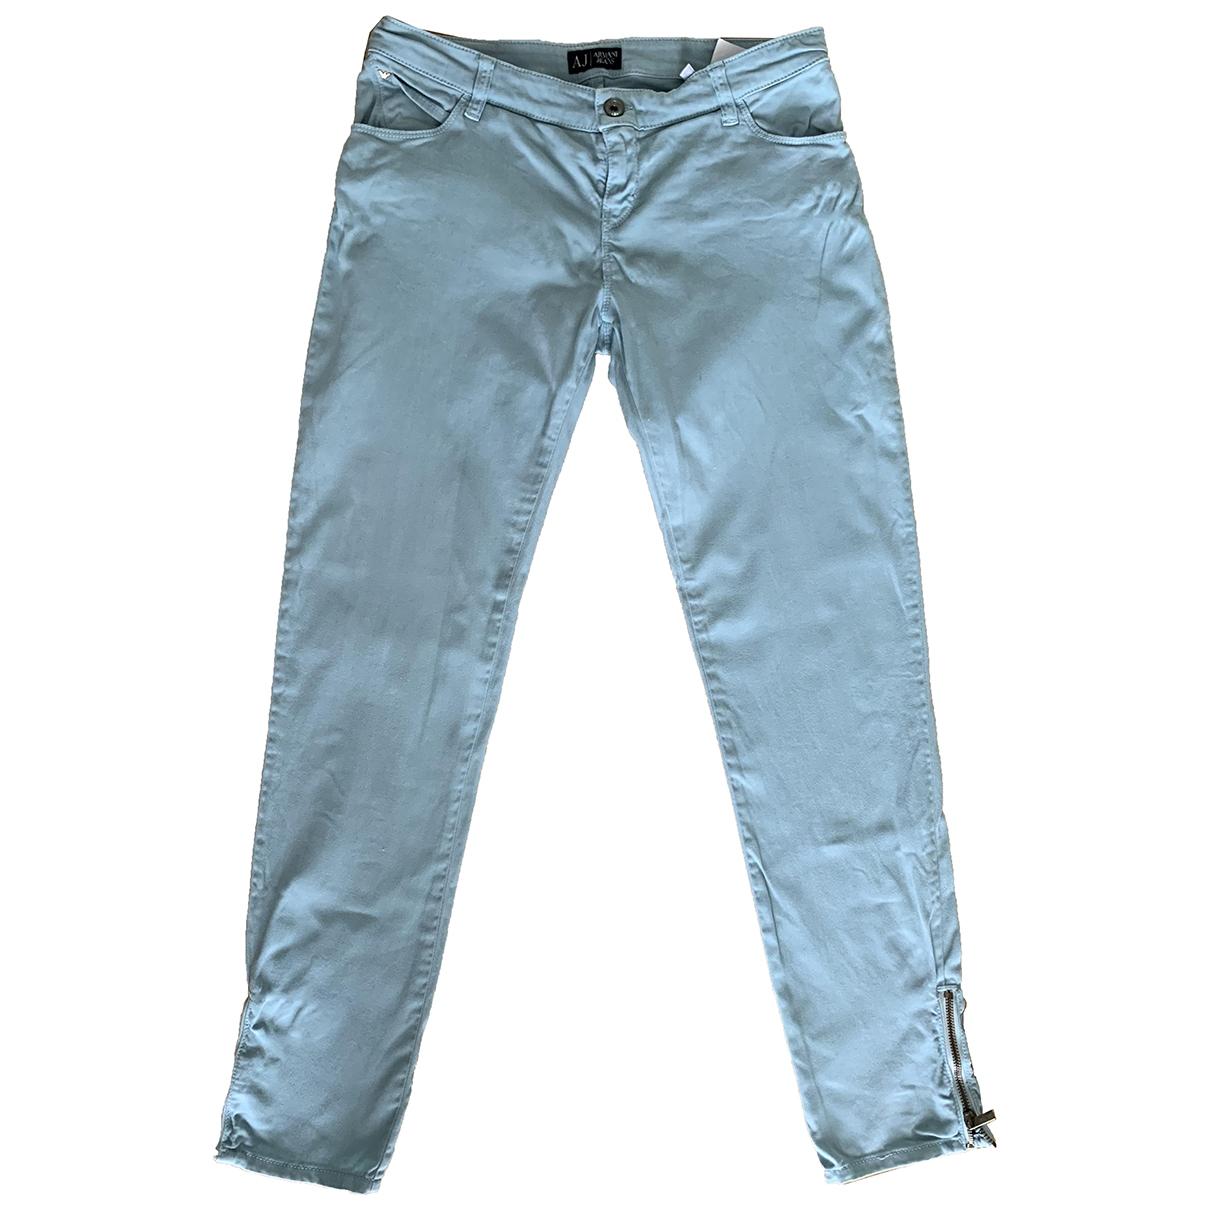 Pantalon en Algodon Armani Jeans